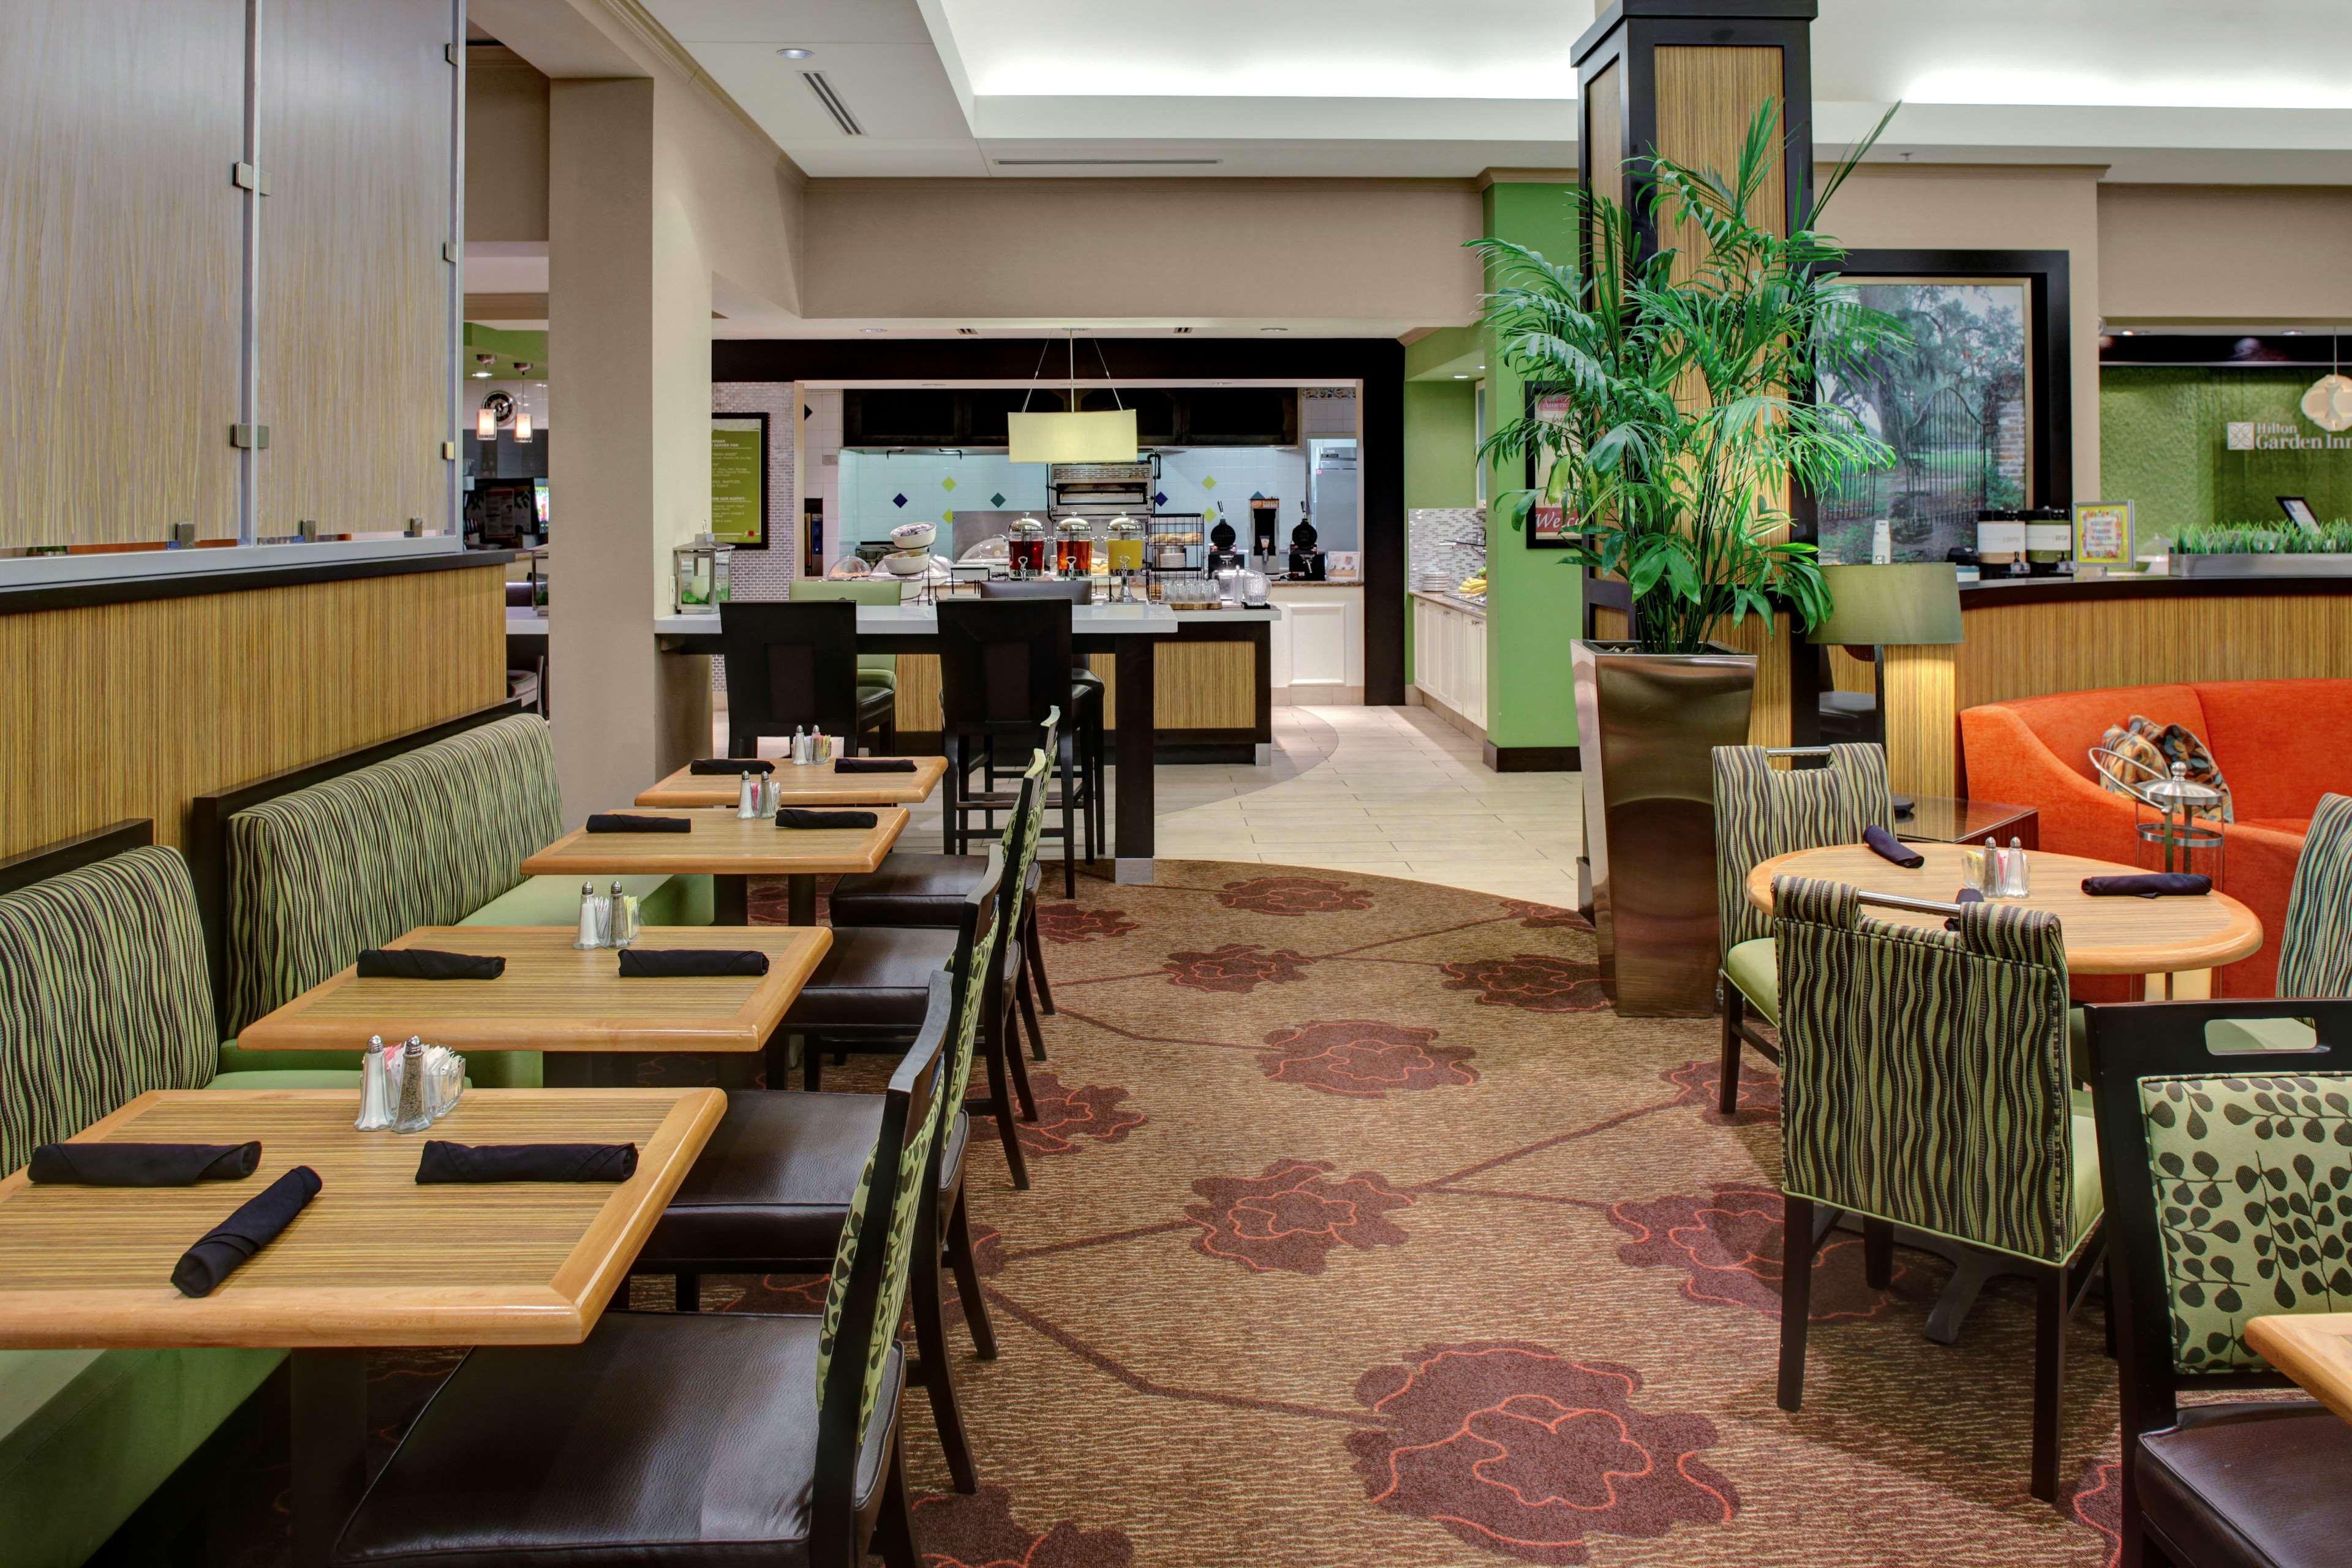 hilton garden inn atlanta northalpharetta 4025 windward plaza alpharetta ga hotels motels mapquest - Hilton Garden Inn Alpharetta